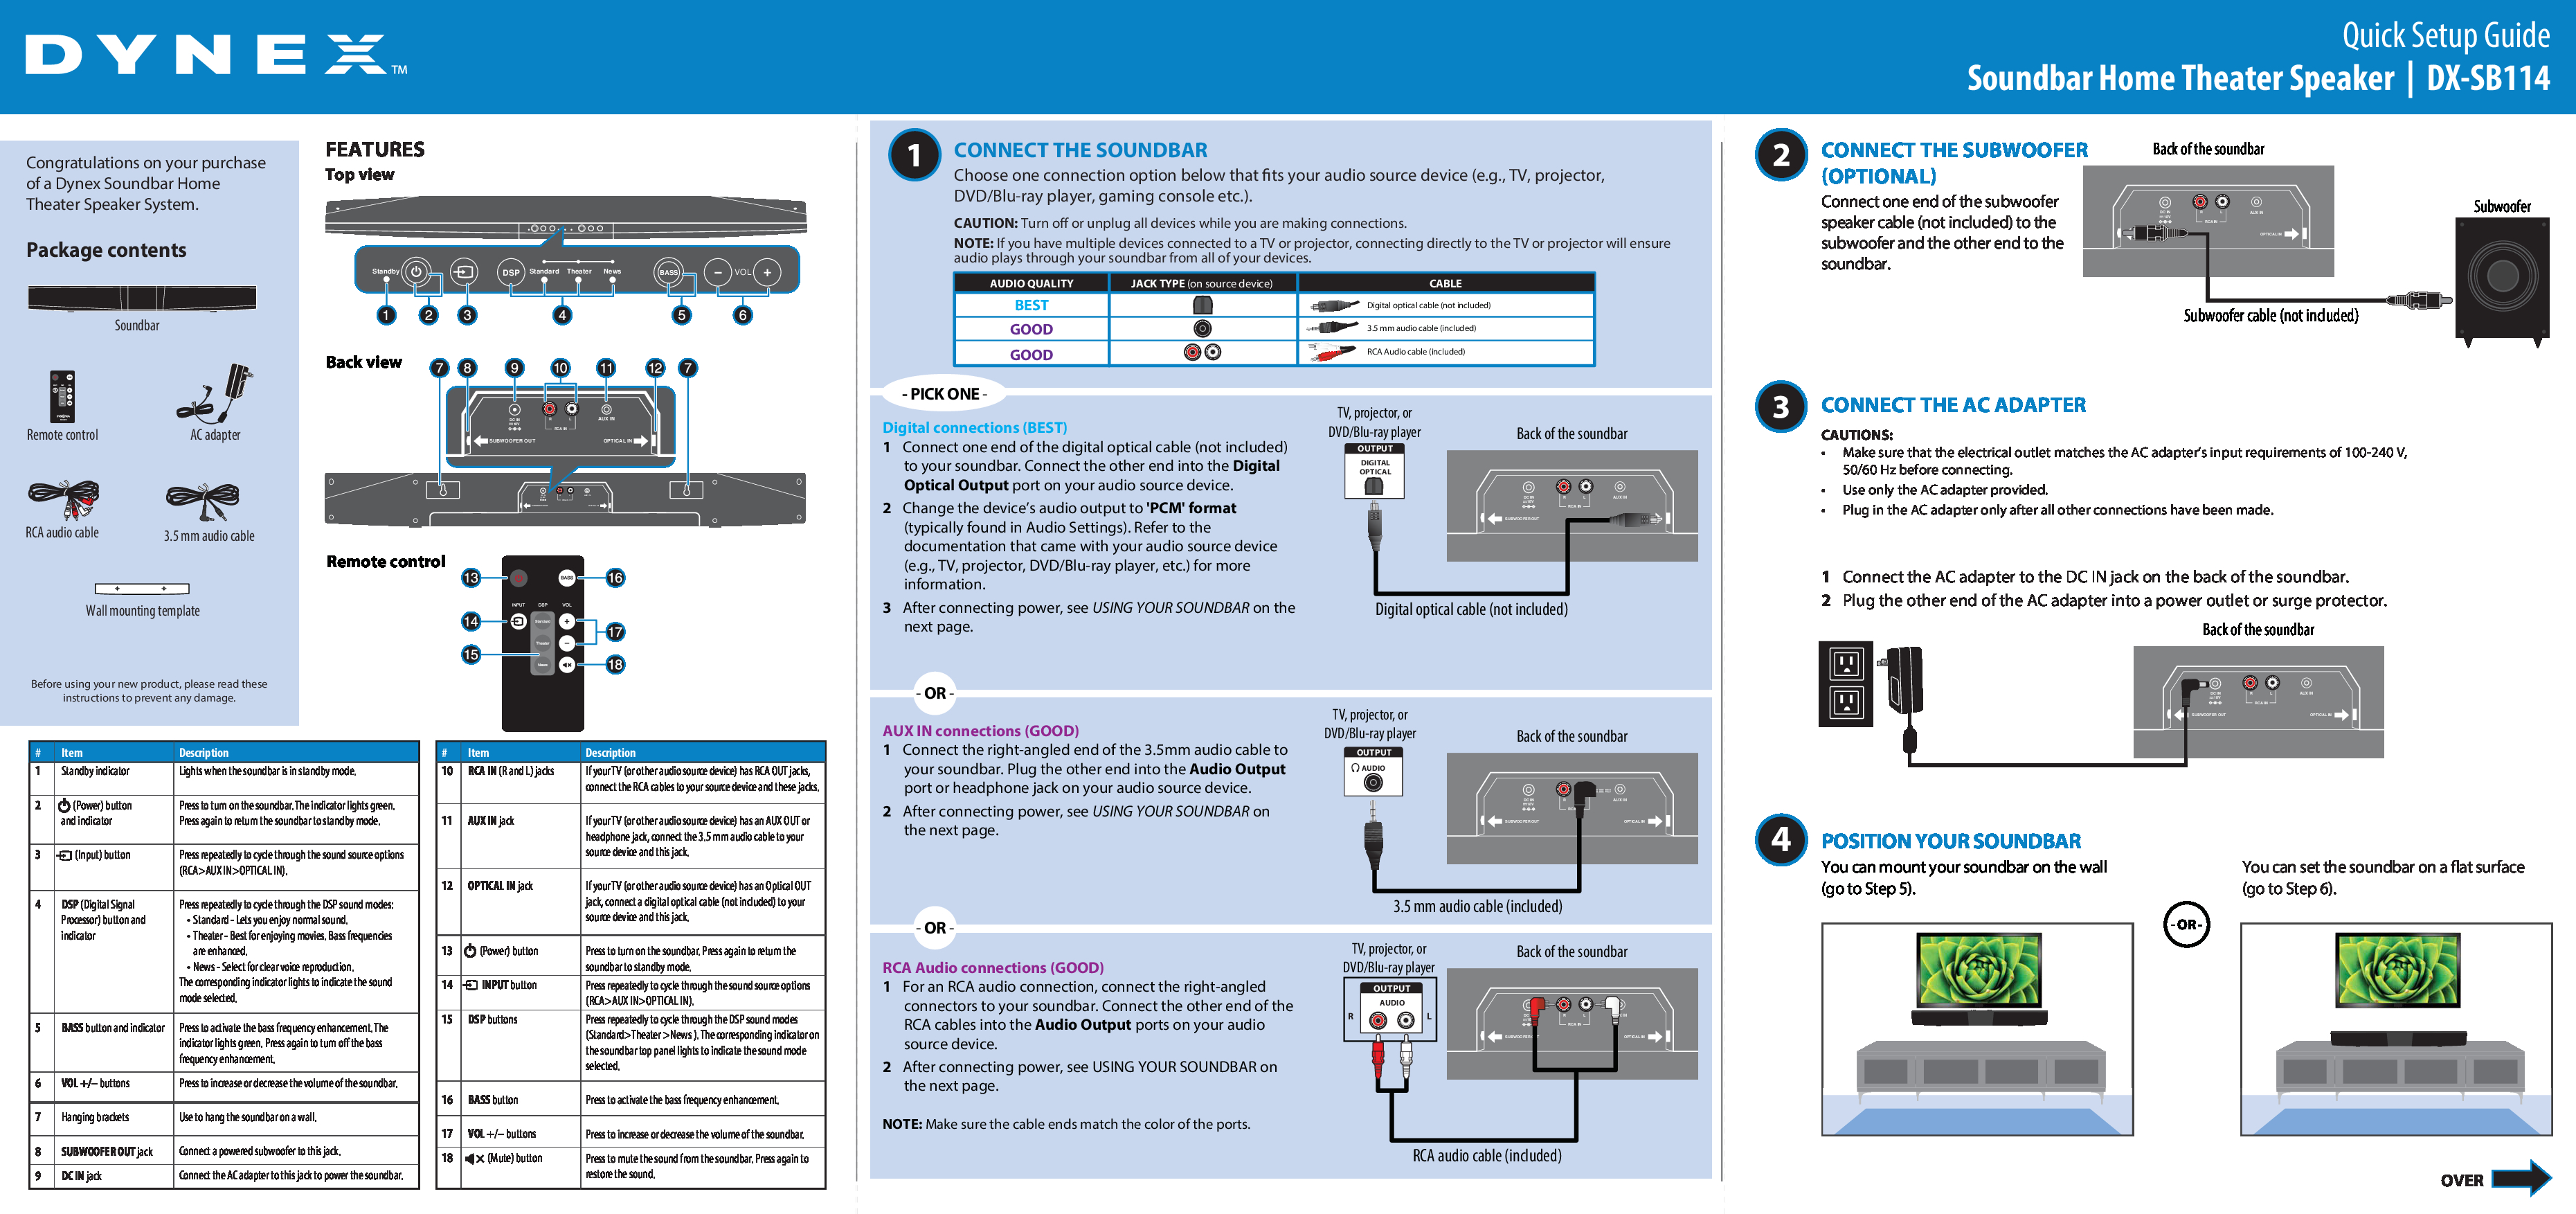 Dynex DX-SB114 manuals